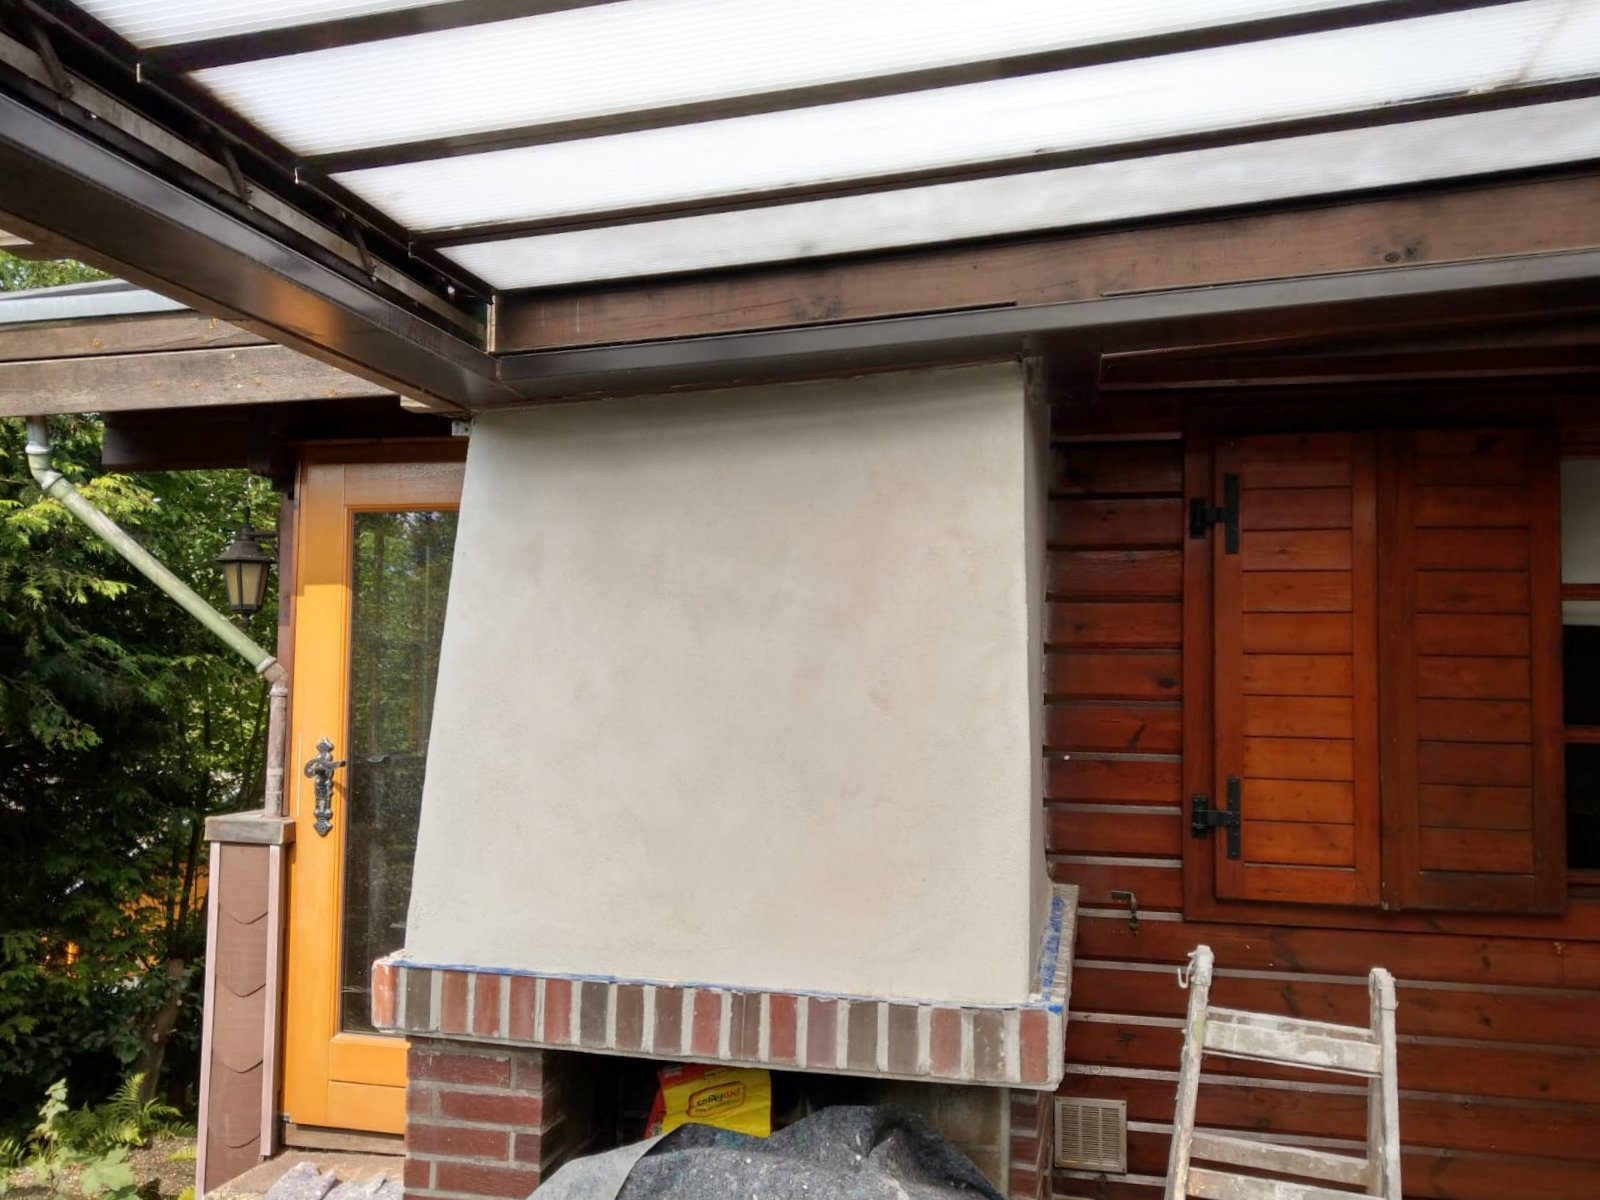 Mandic Baudekoration Kamin Sanierung 4